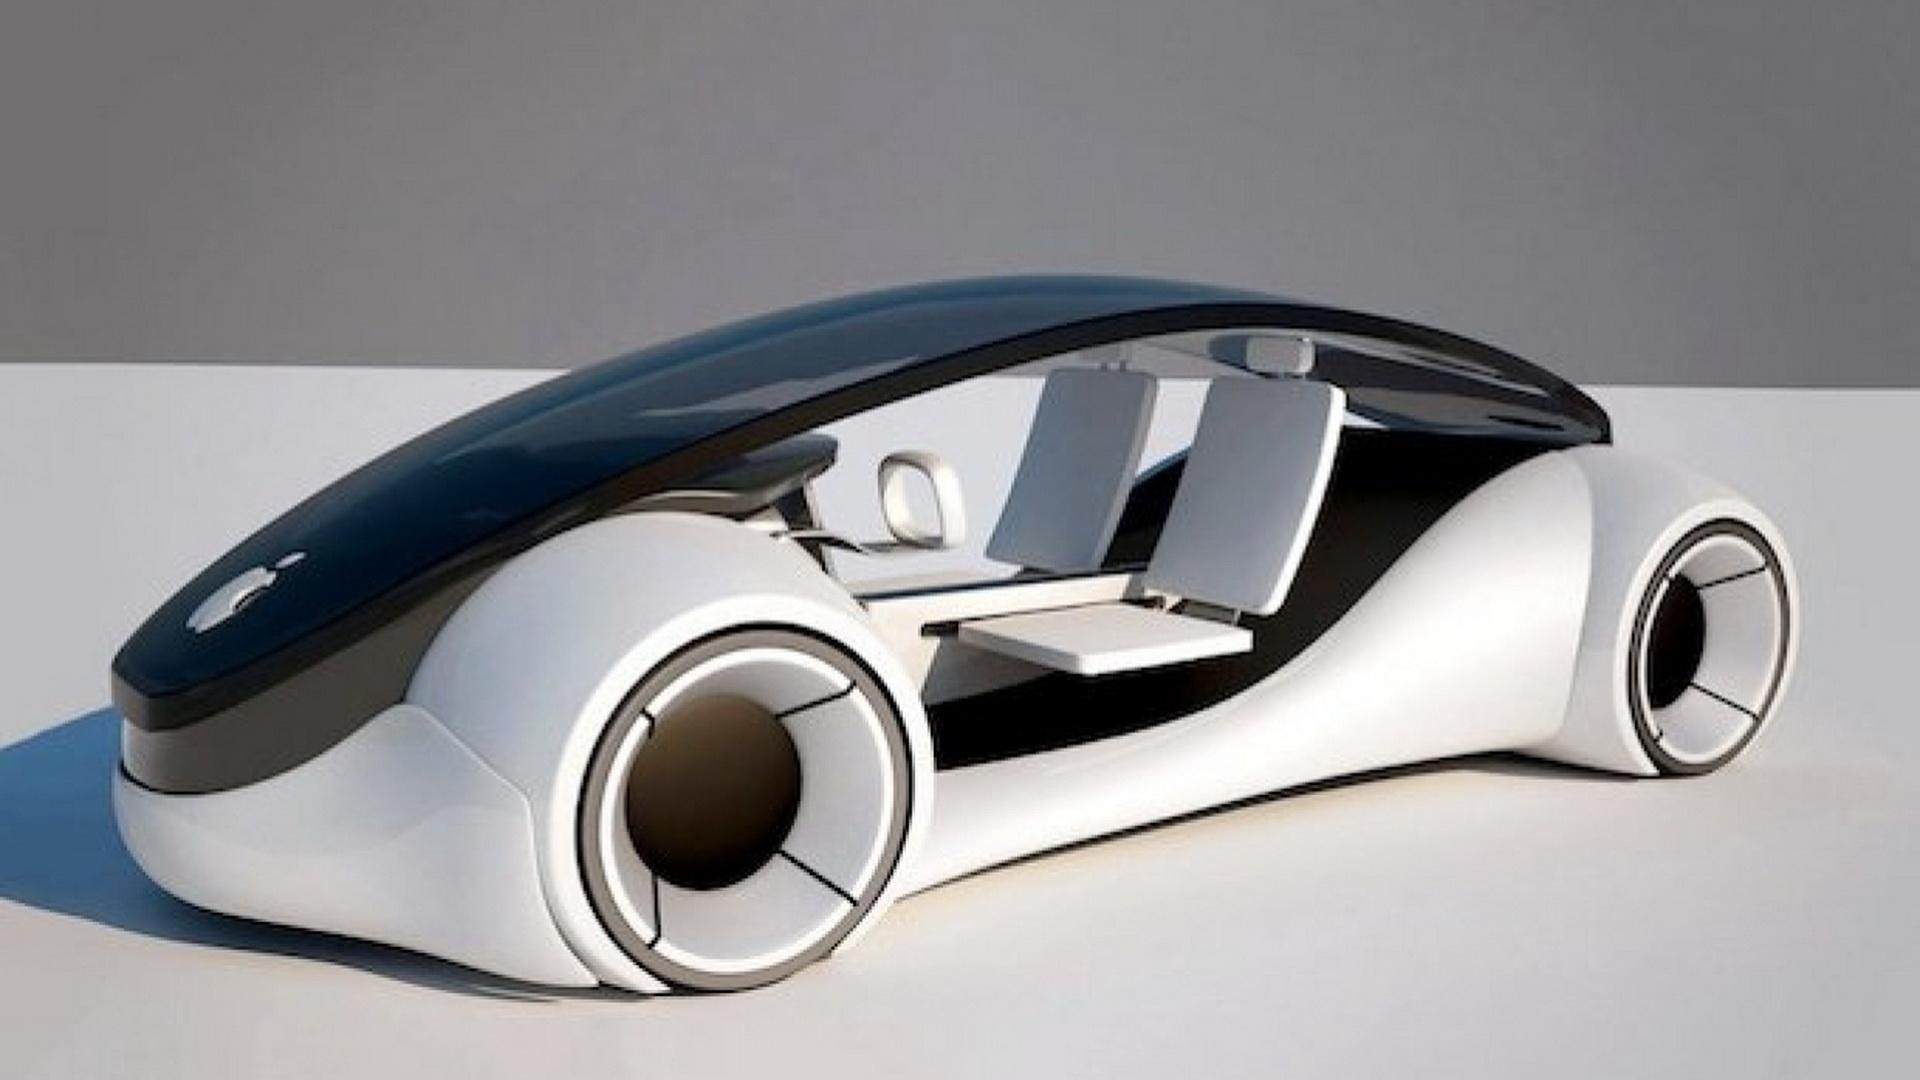 Стала известна дата начала производства автомобиля Apple